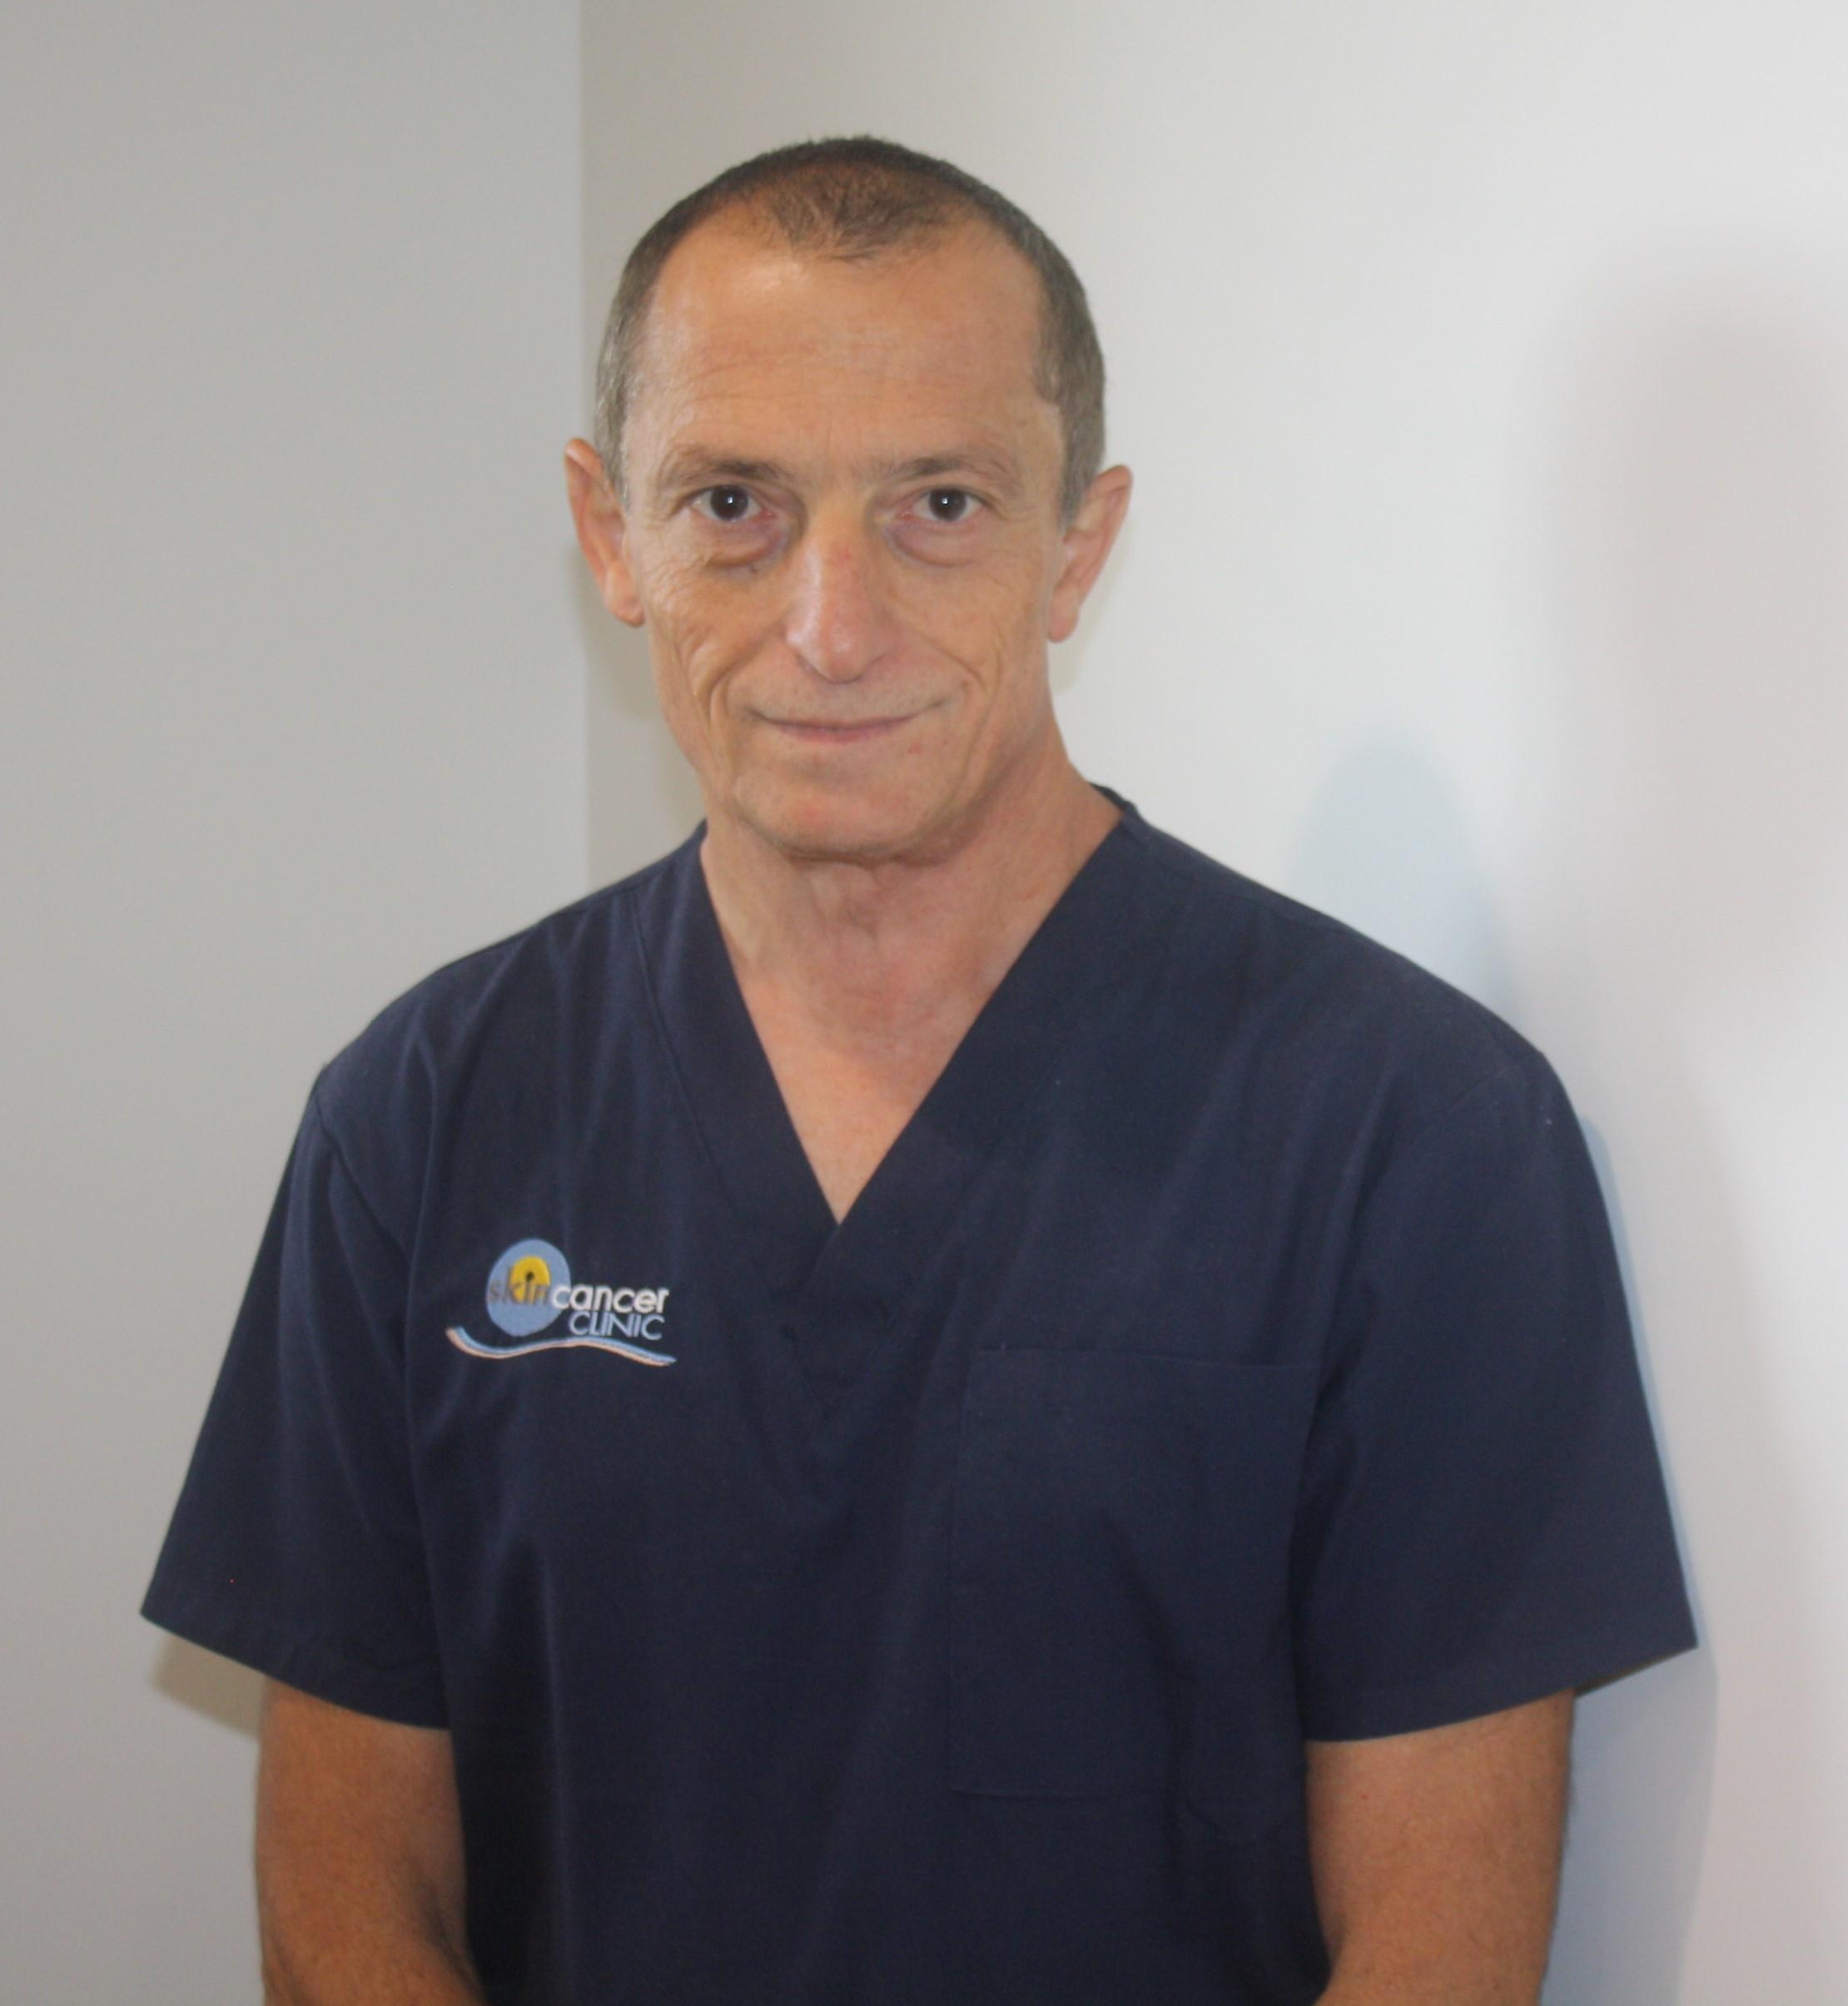 Dr Nick Theris